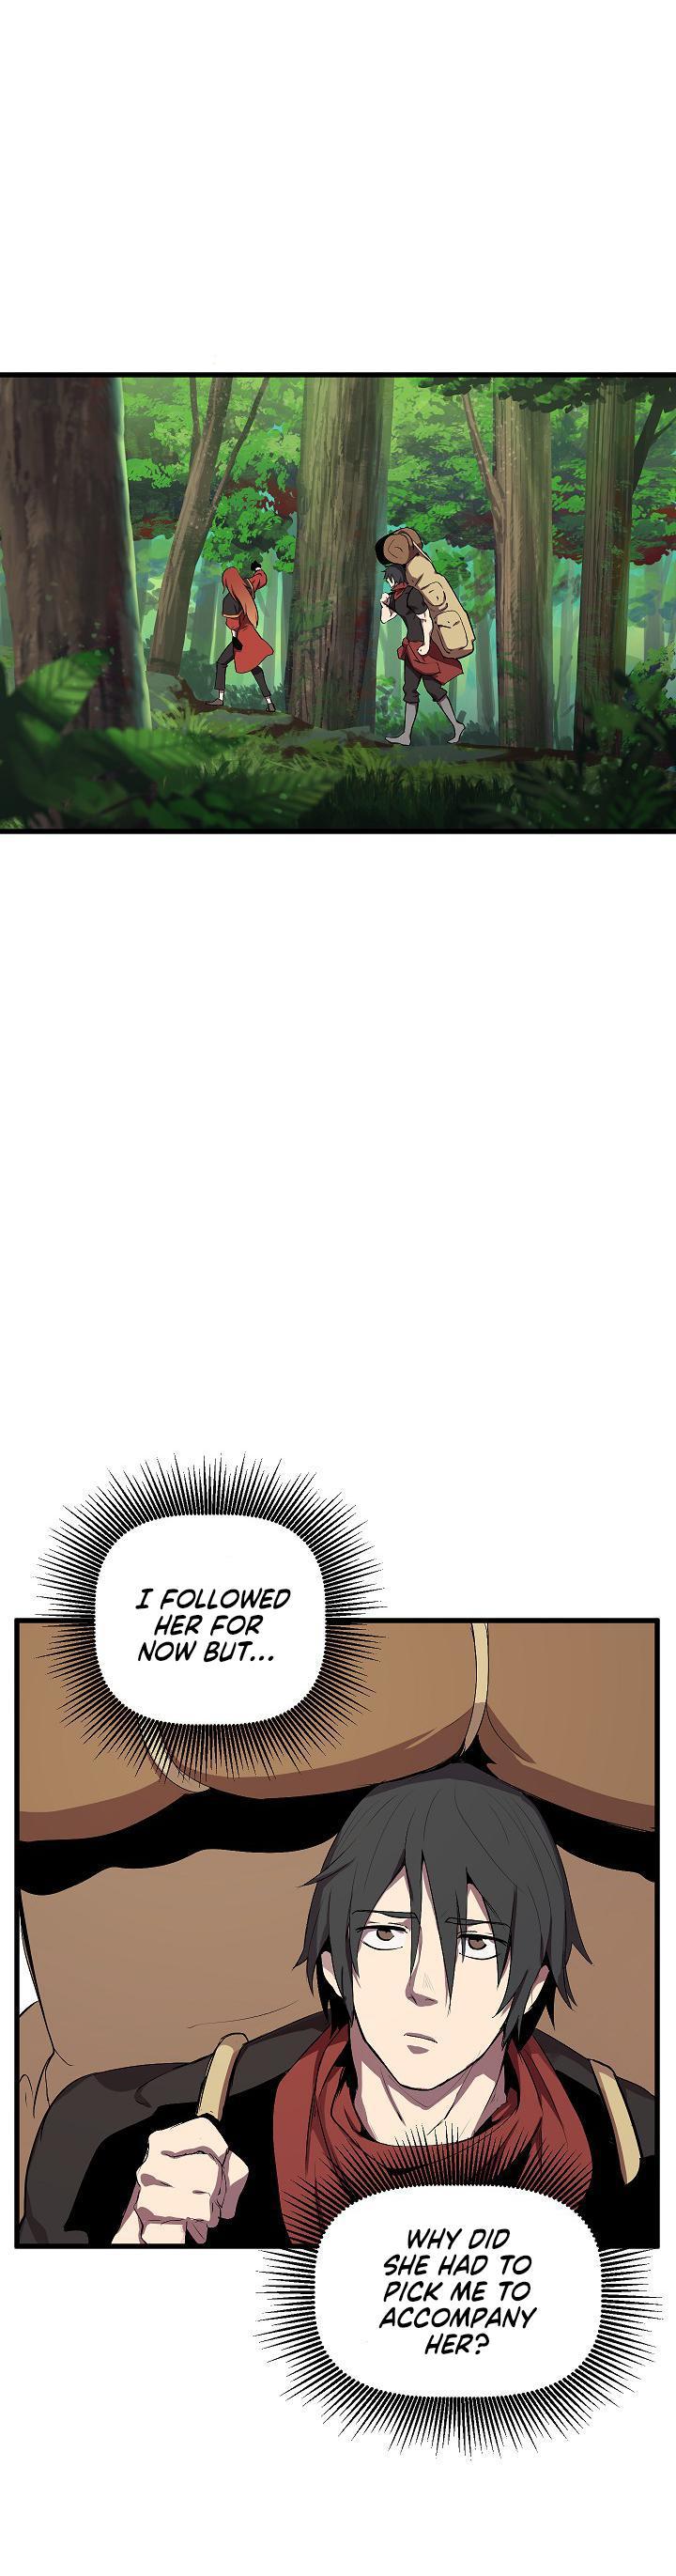 Survival Story Of A Sword King In A Fantasy World Vol.1 Chapter 15 page 16 - Mangakakalots.com